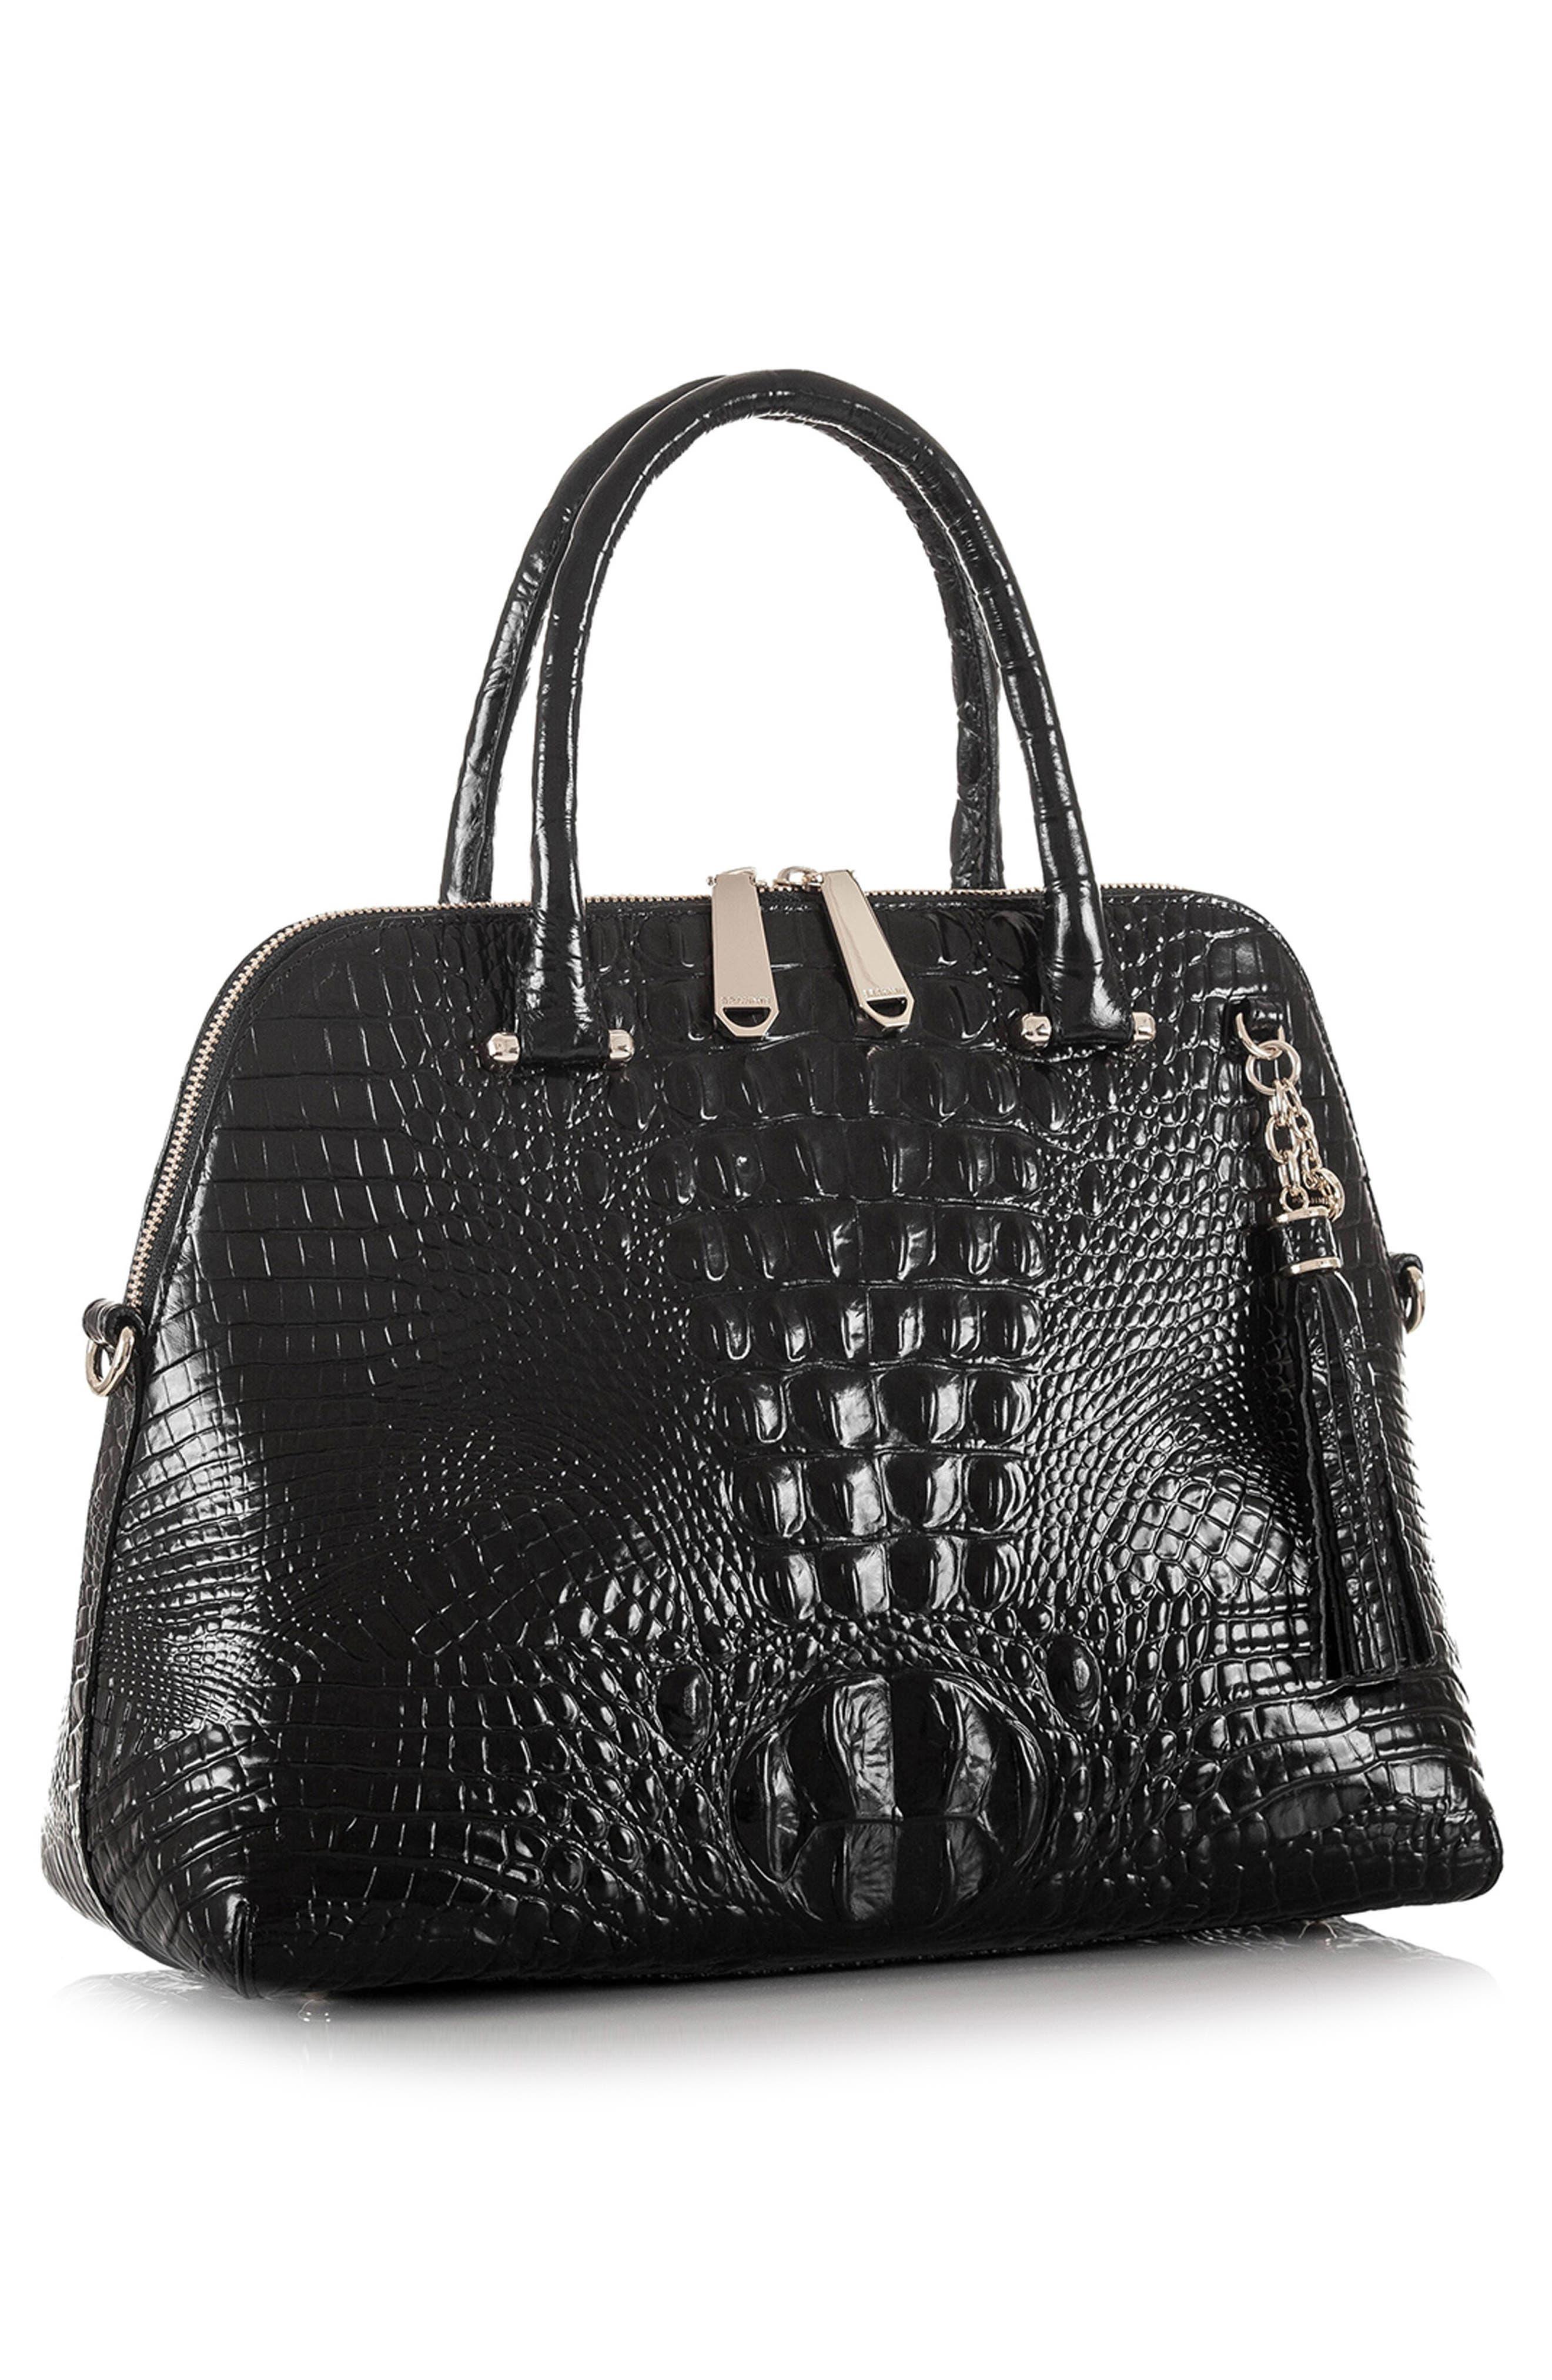 Melbourne – Sydney Croc Embossed Leather Satchel,                             Alternate thumbnail 8, color,                             BLACK